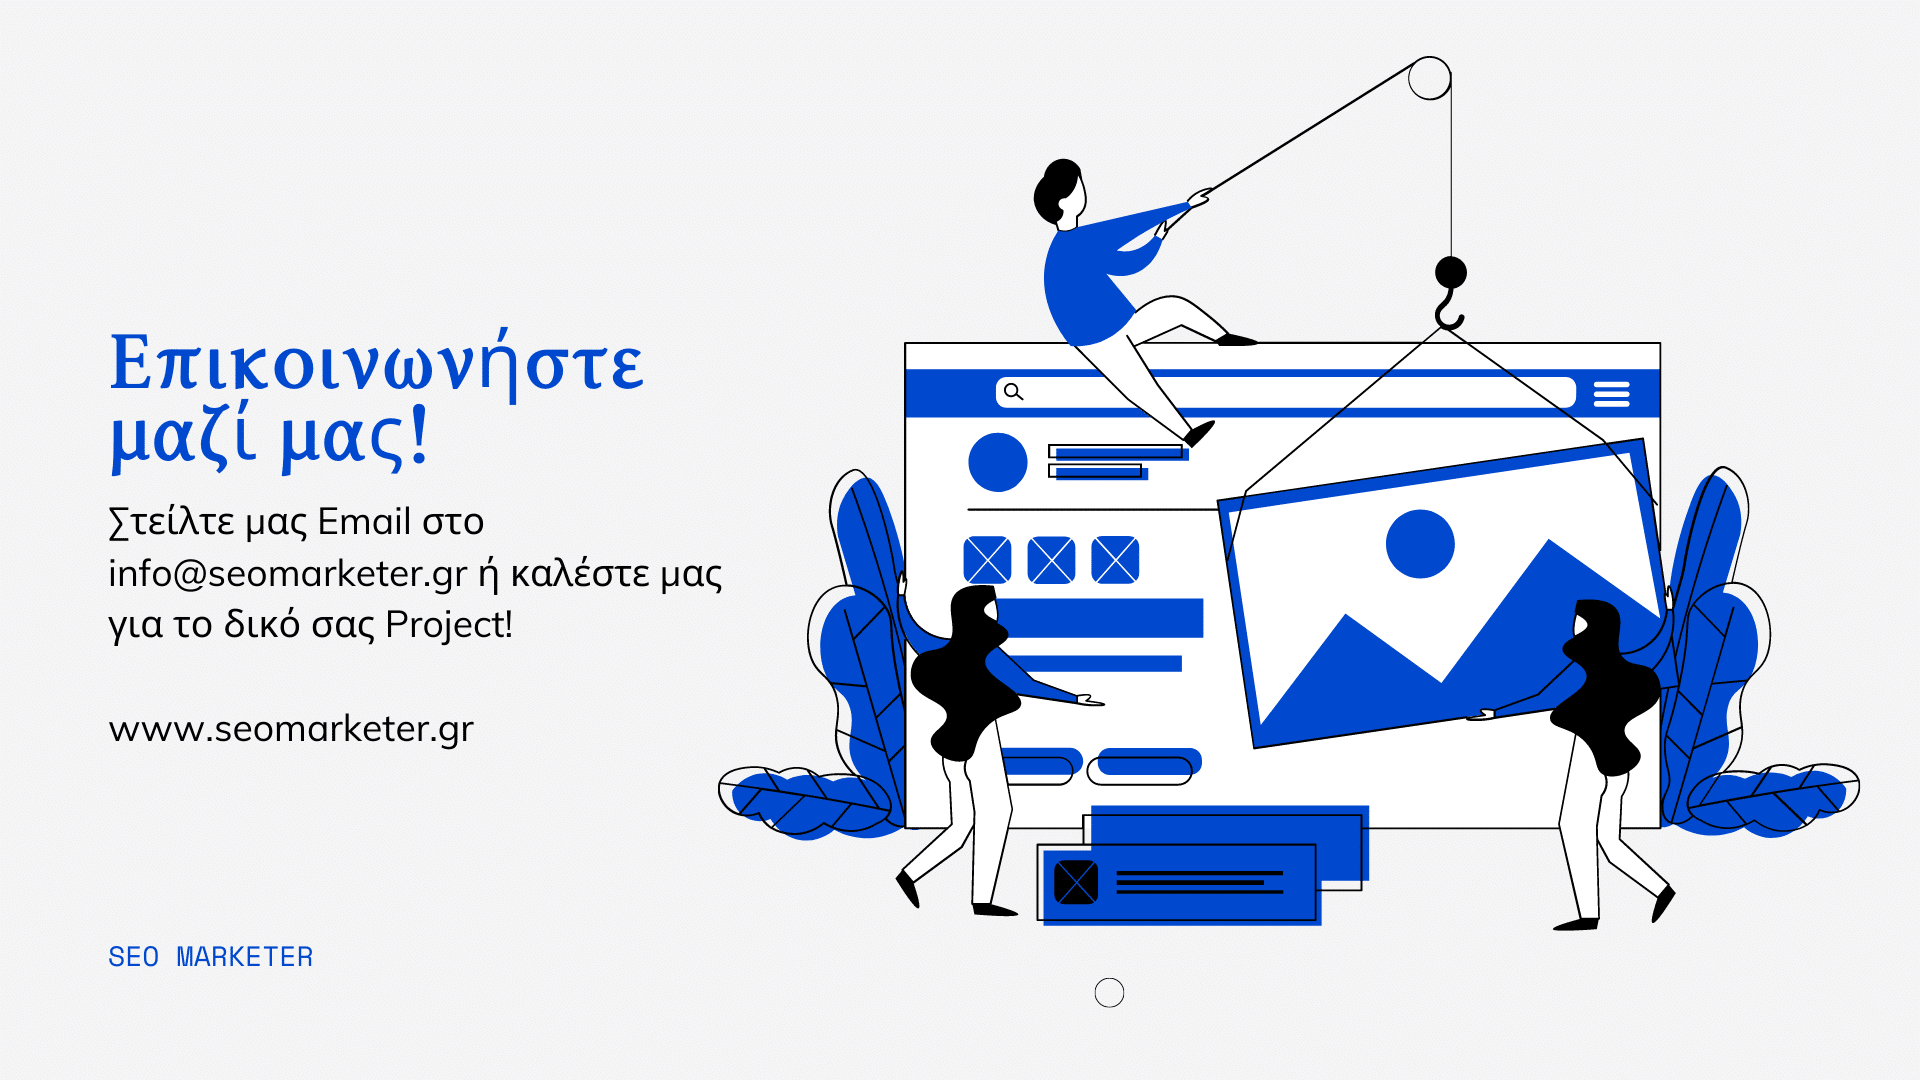 Google SEO οδηγός για πρώτη σελίδα στις μηχανές αναζήτησης, Προώθηση ιστοσελίδων SEO Marketer